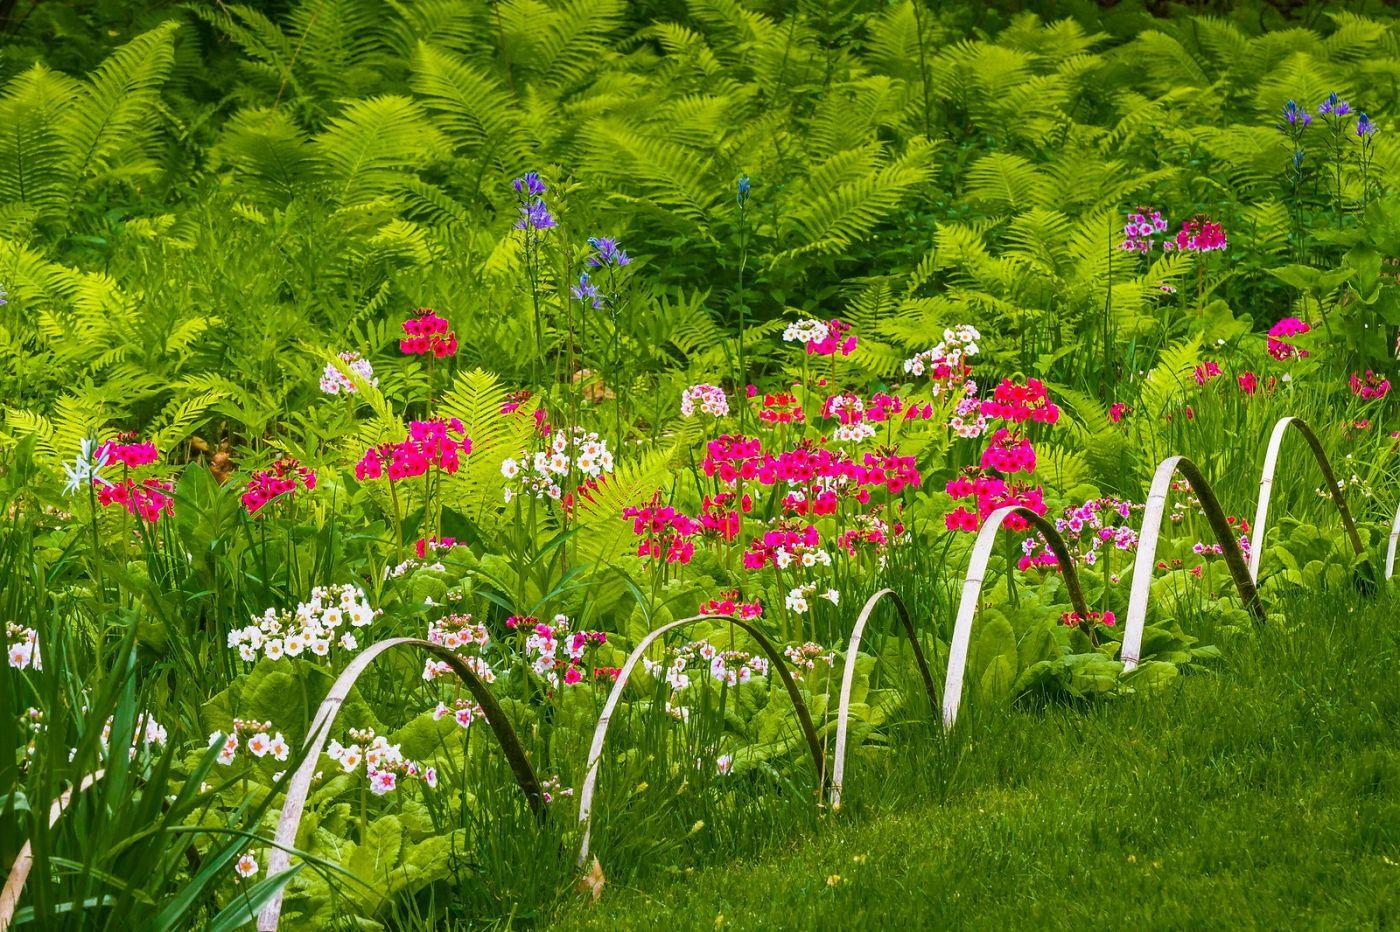 Chanticleer花园,有梦想的季节_图1-4